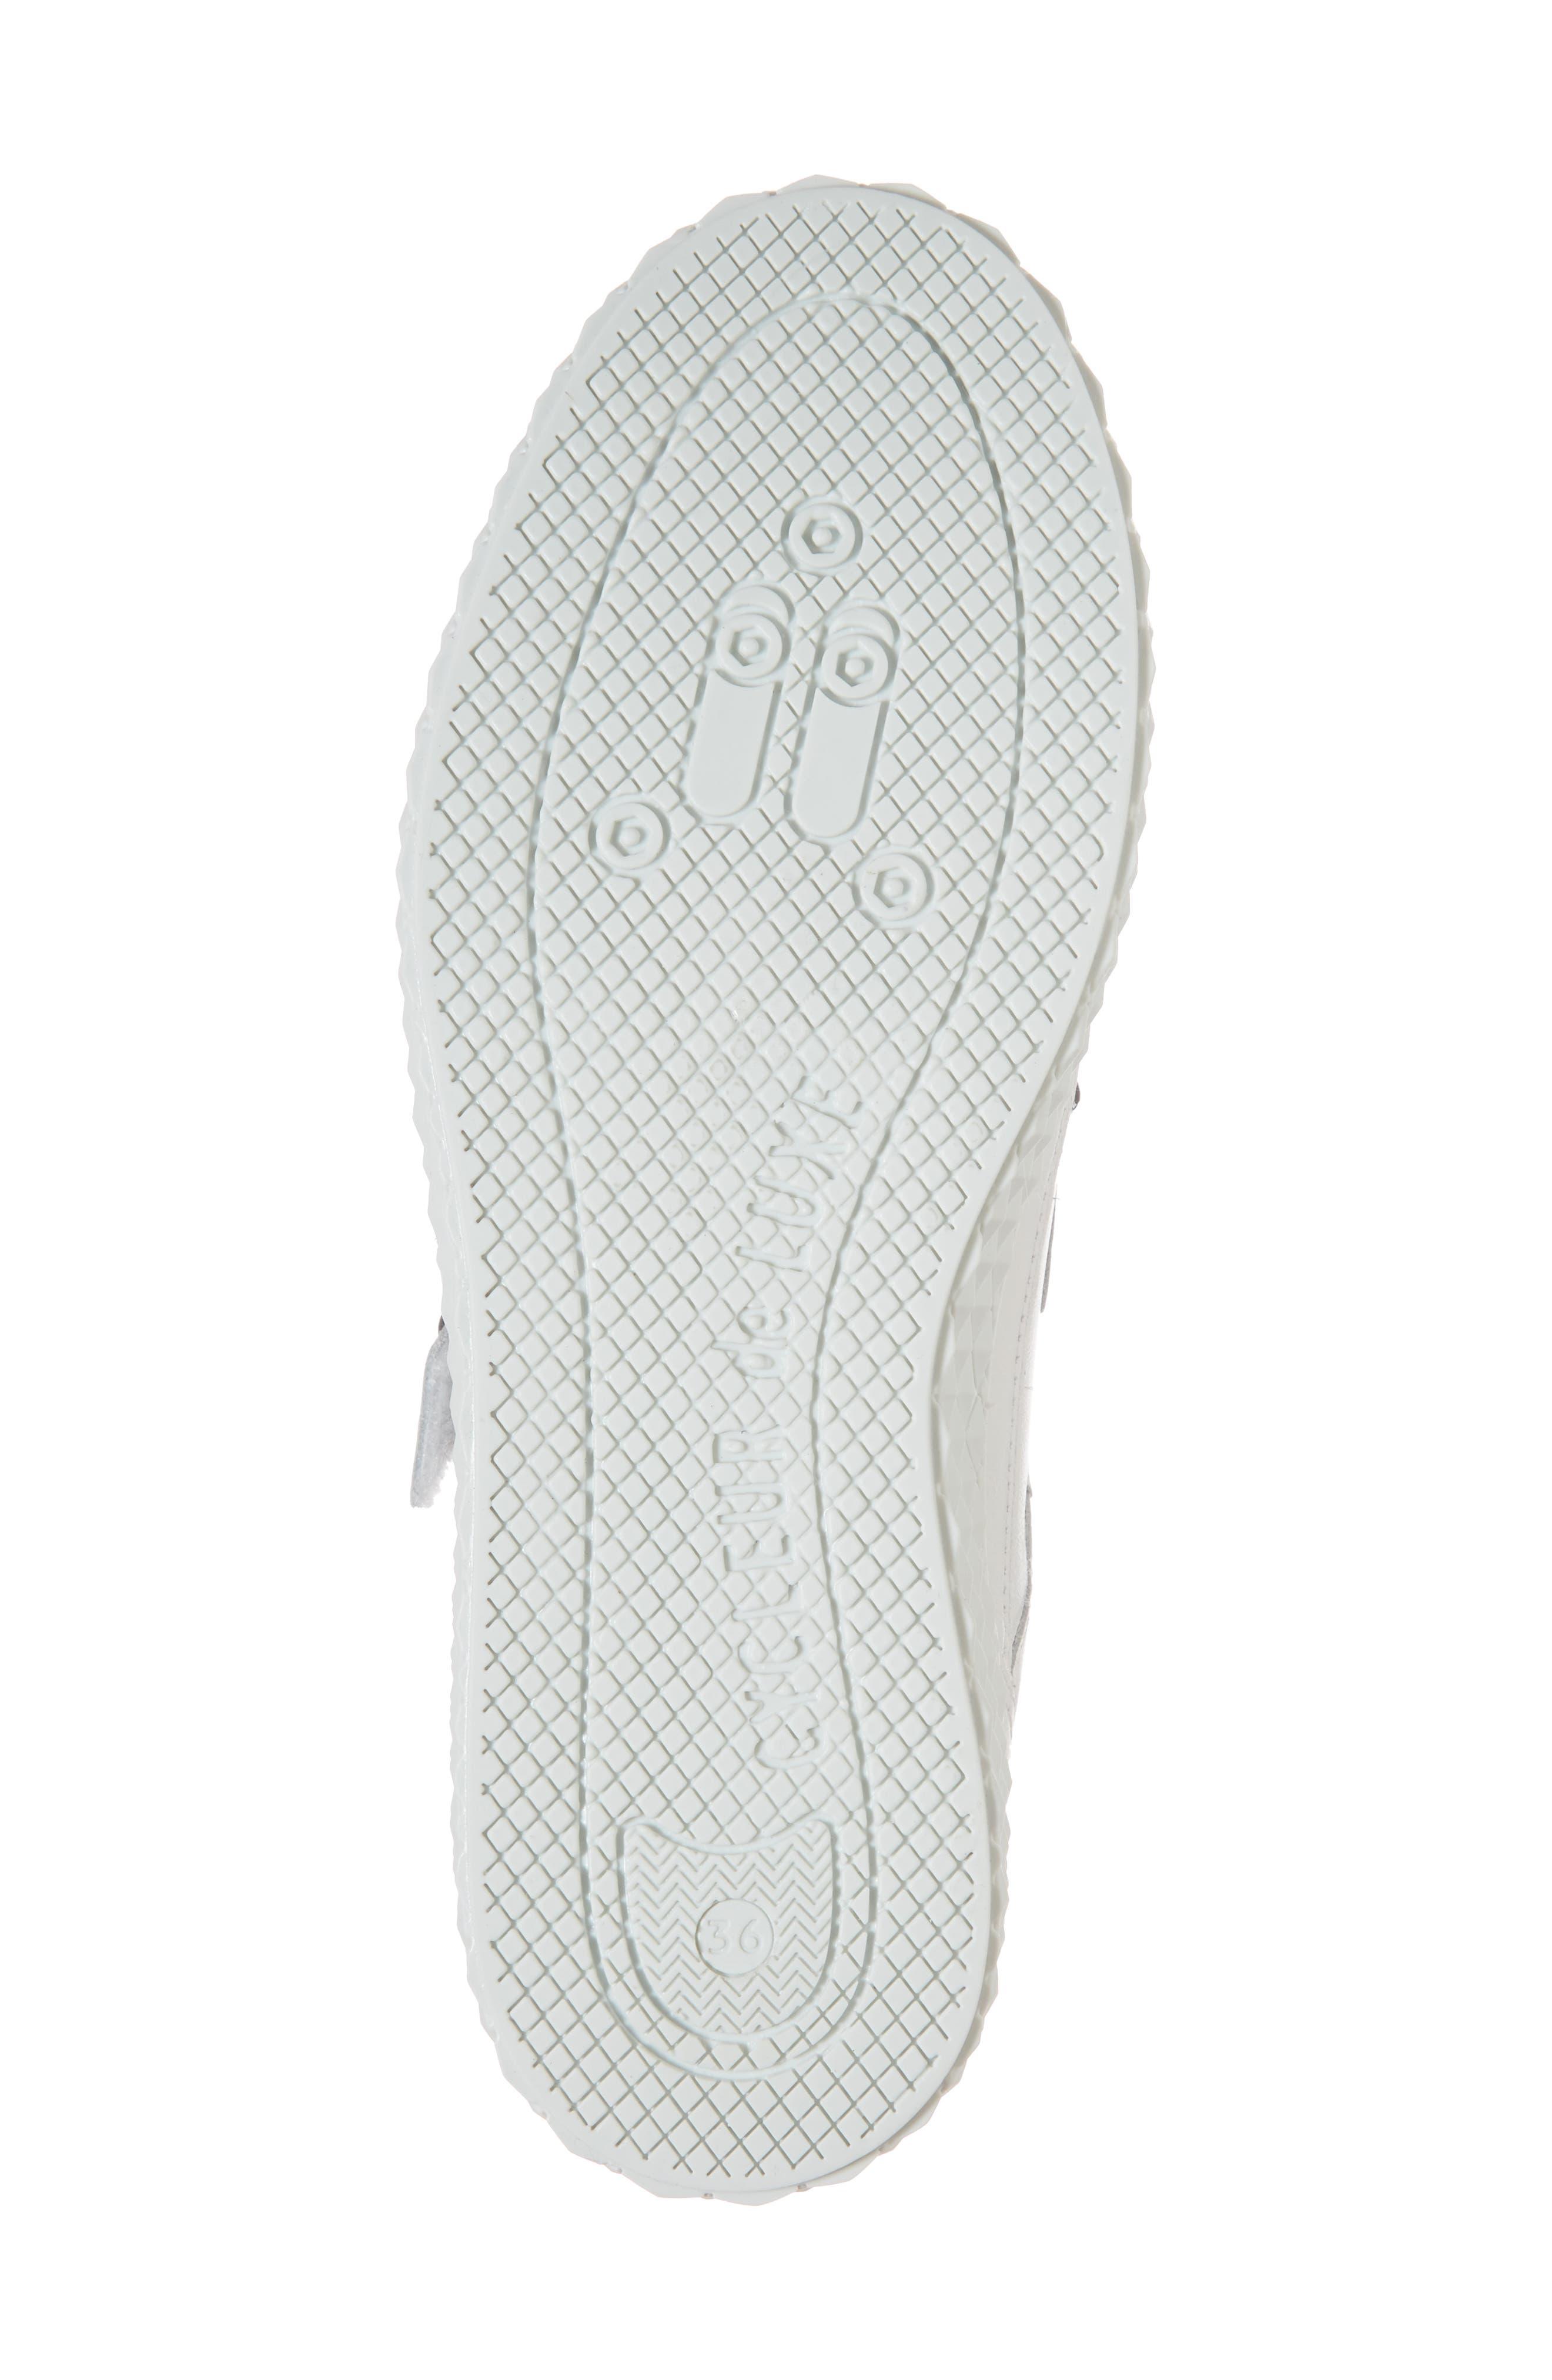 Hurou Embellished Sneaker,                             Alternate thumbnail 6, color,                             Optic White/ Black Leather